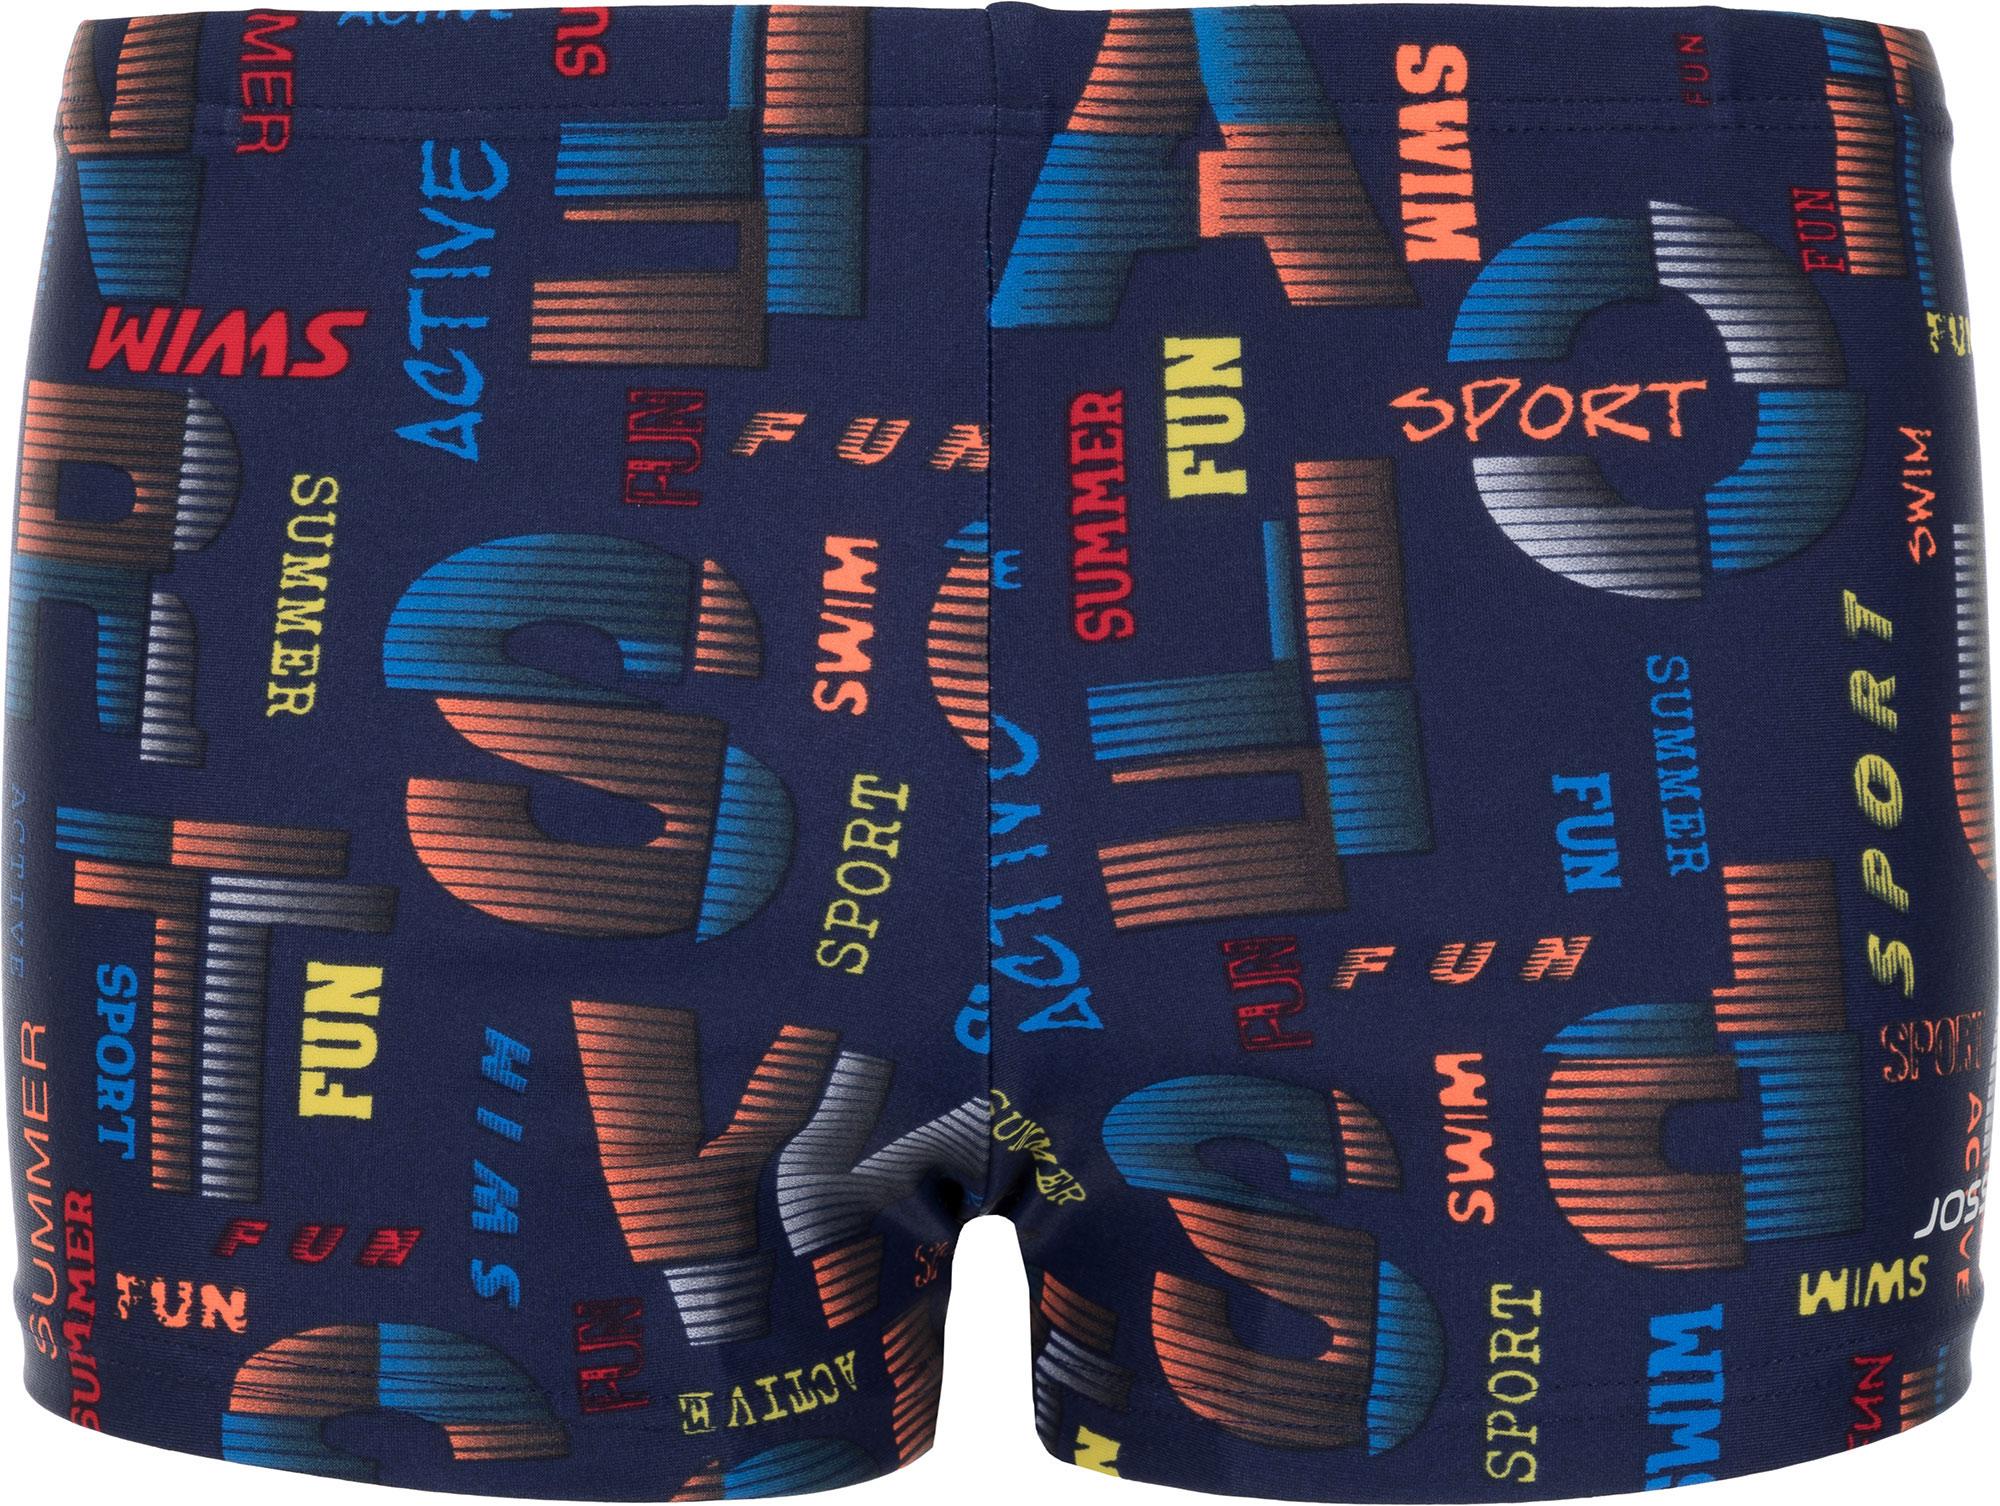 Joss Плавки-шорты для мальчиков Joss, размер 140 acoola шорты детские для мальчиков цвет желтый размер 116 21120420008